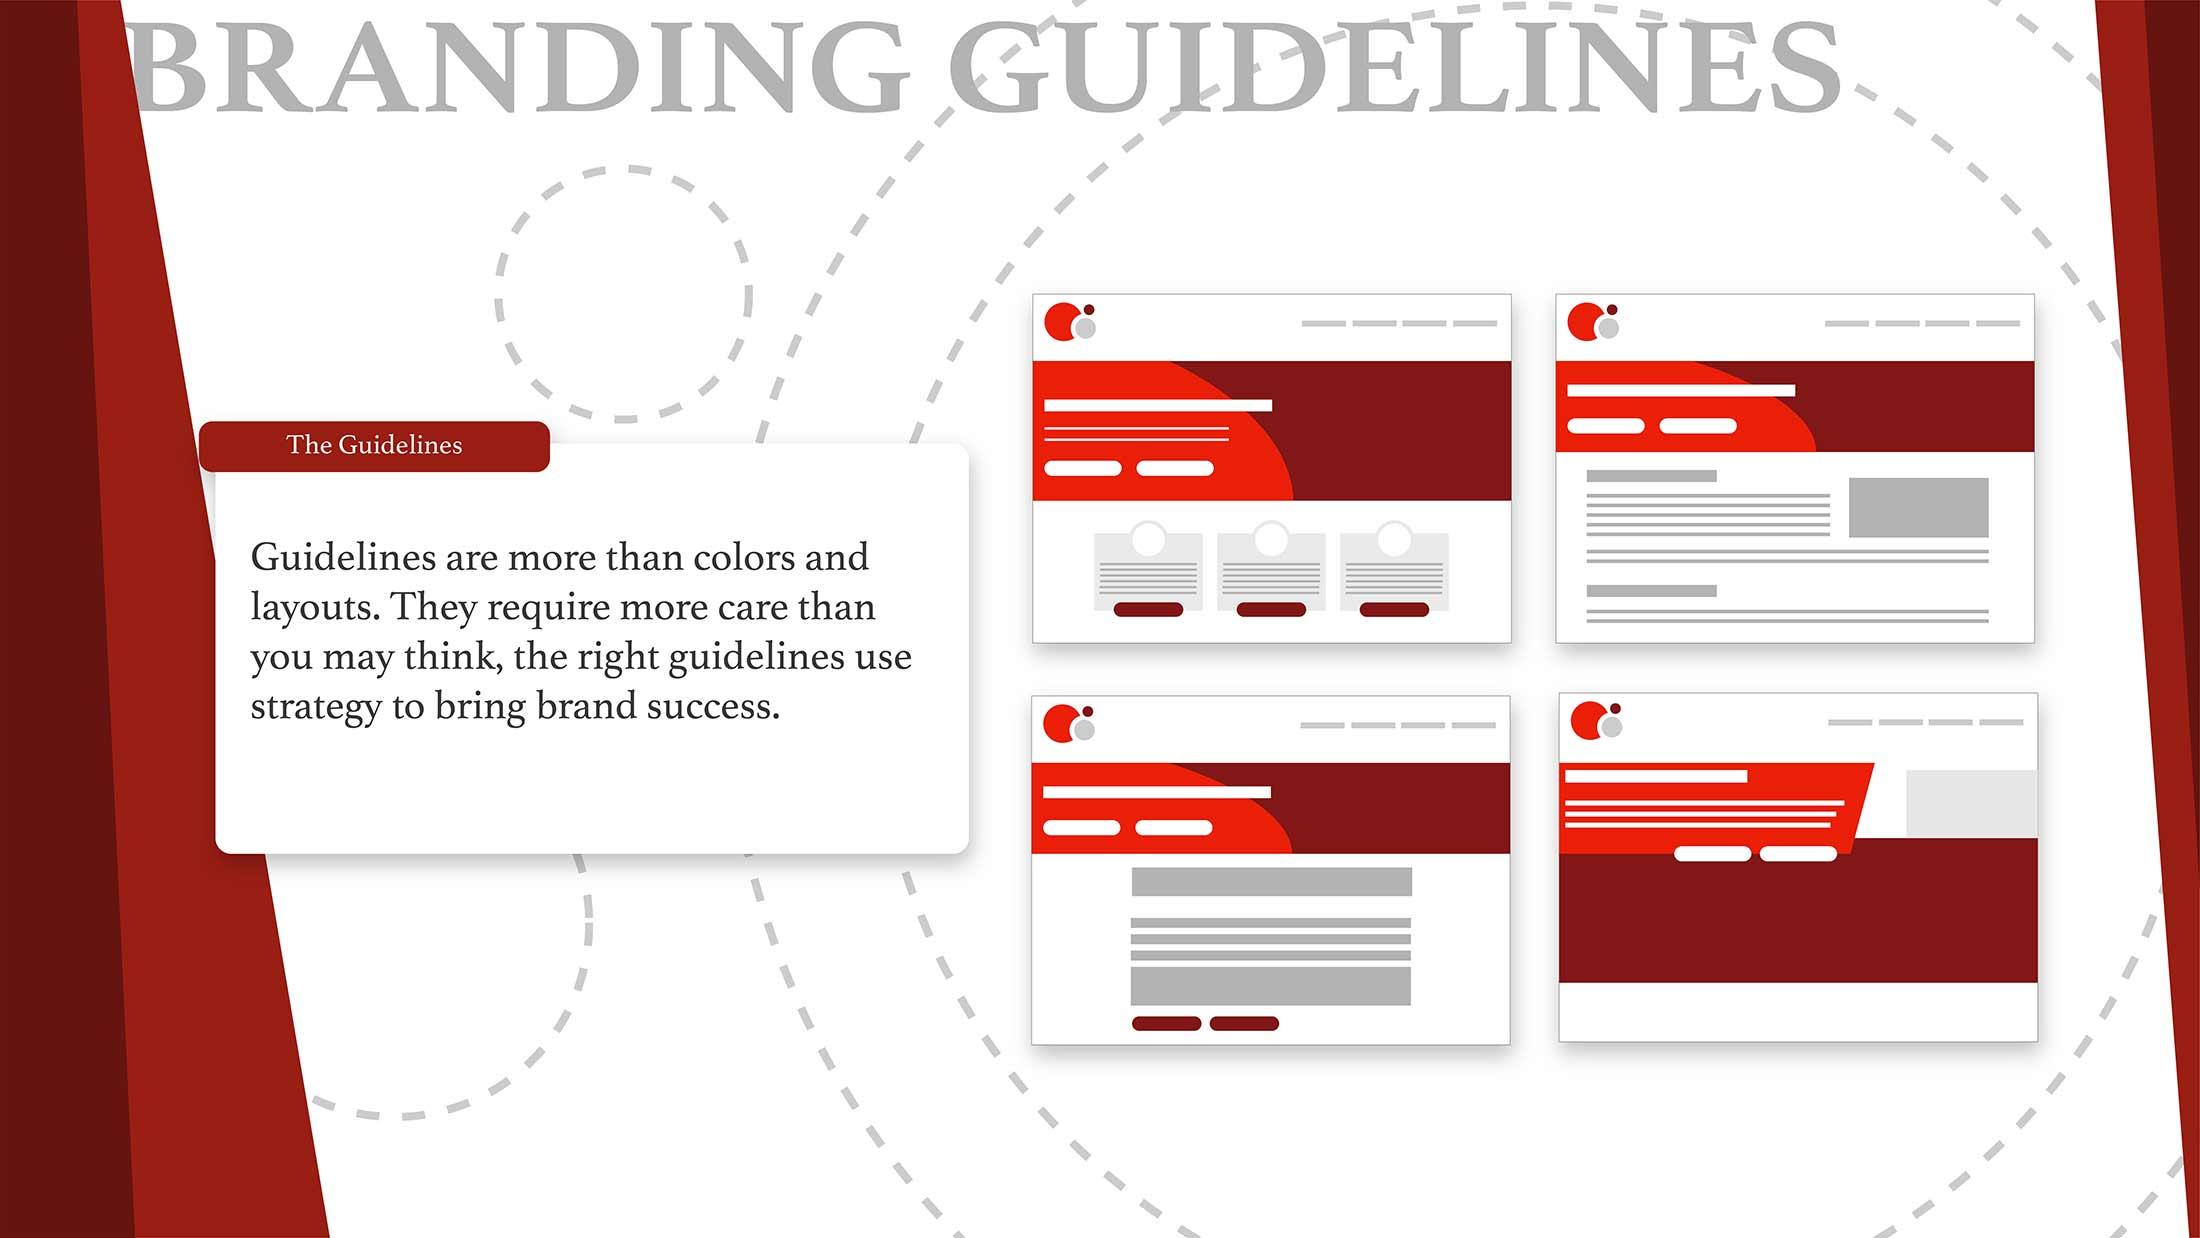 rebranding guidelines